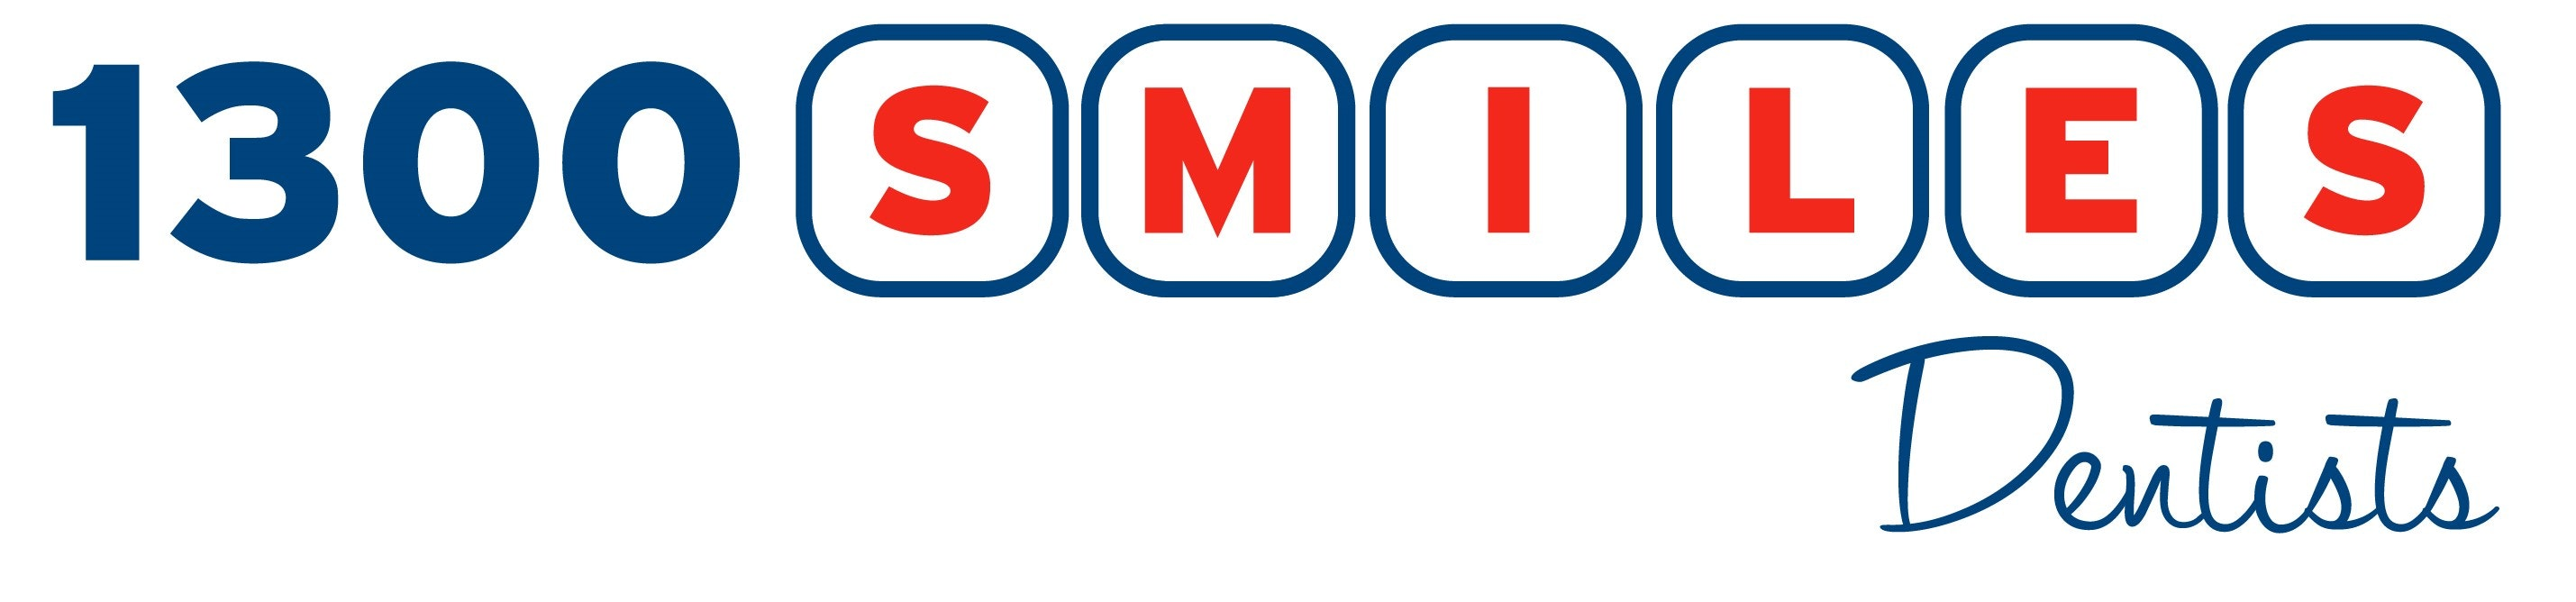 logo for 1300 Smiles - Rockhampton Dentists